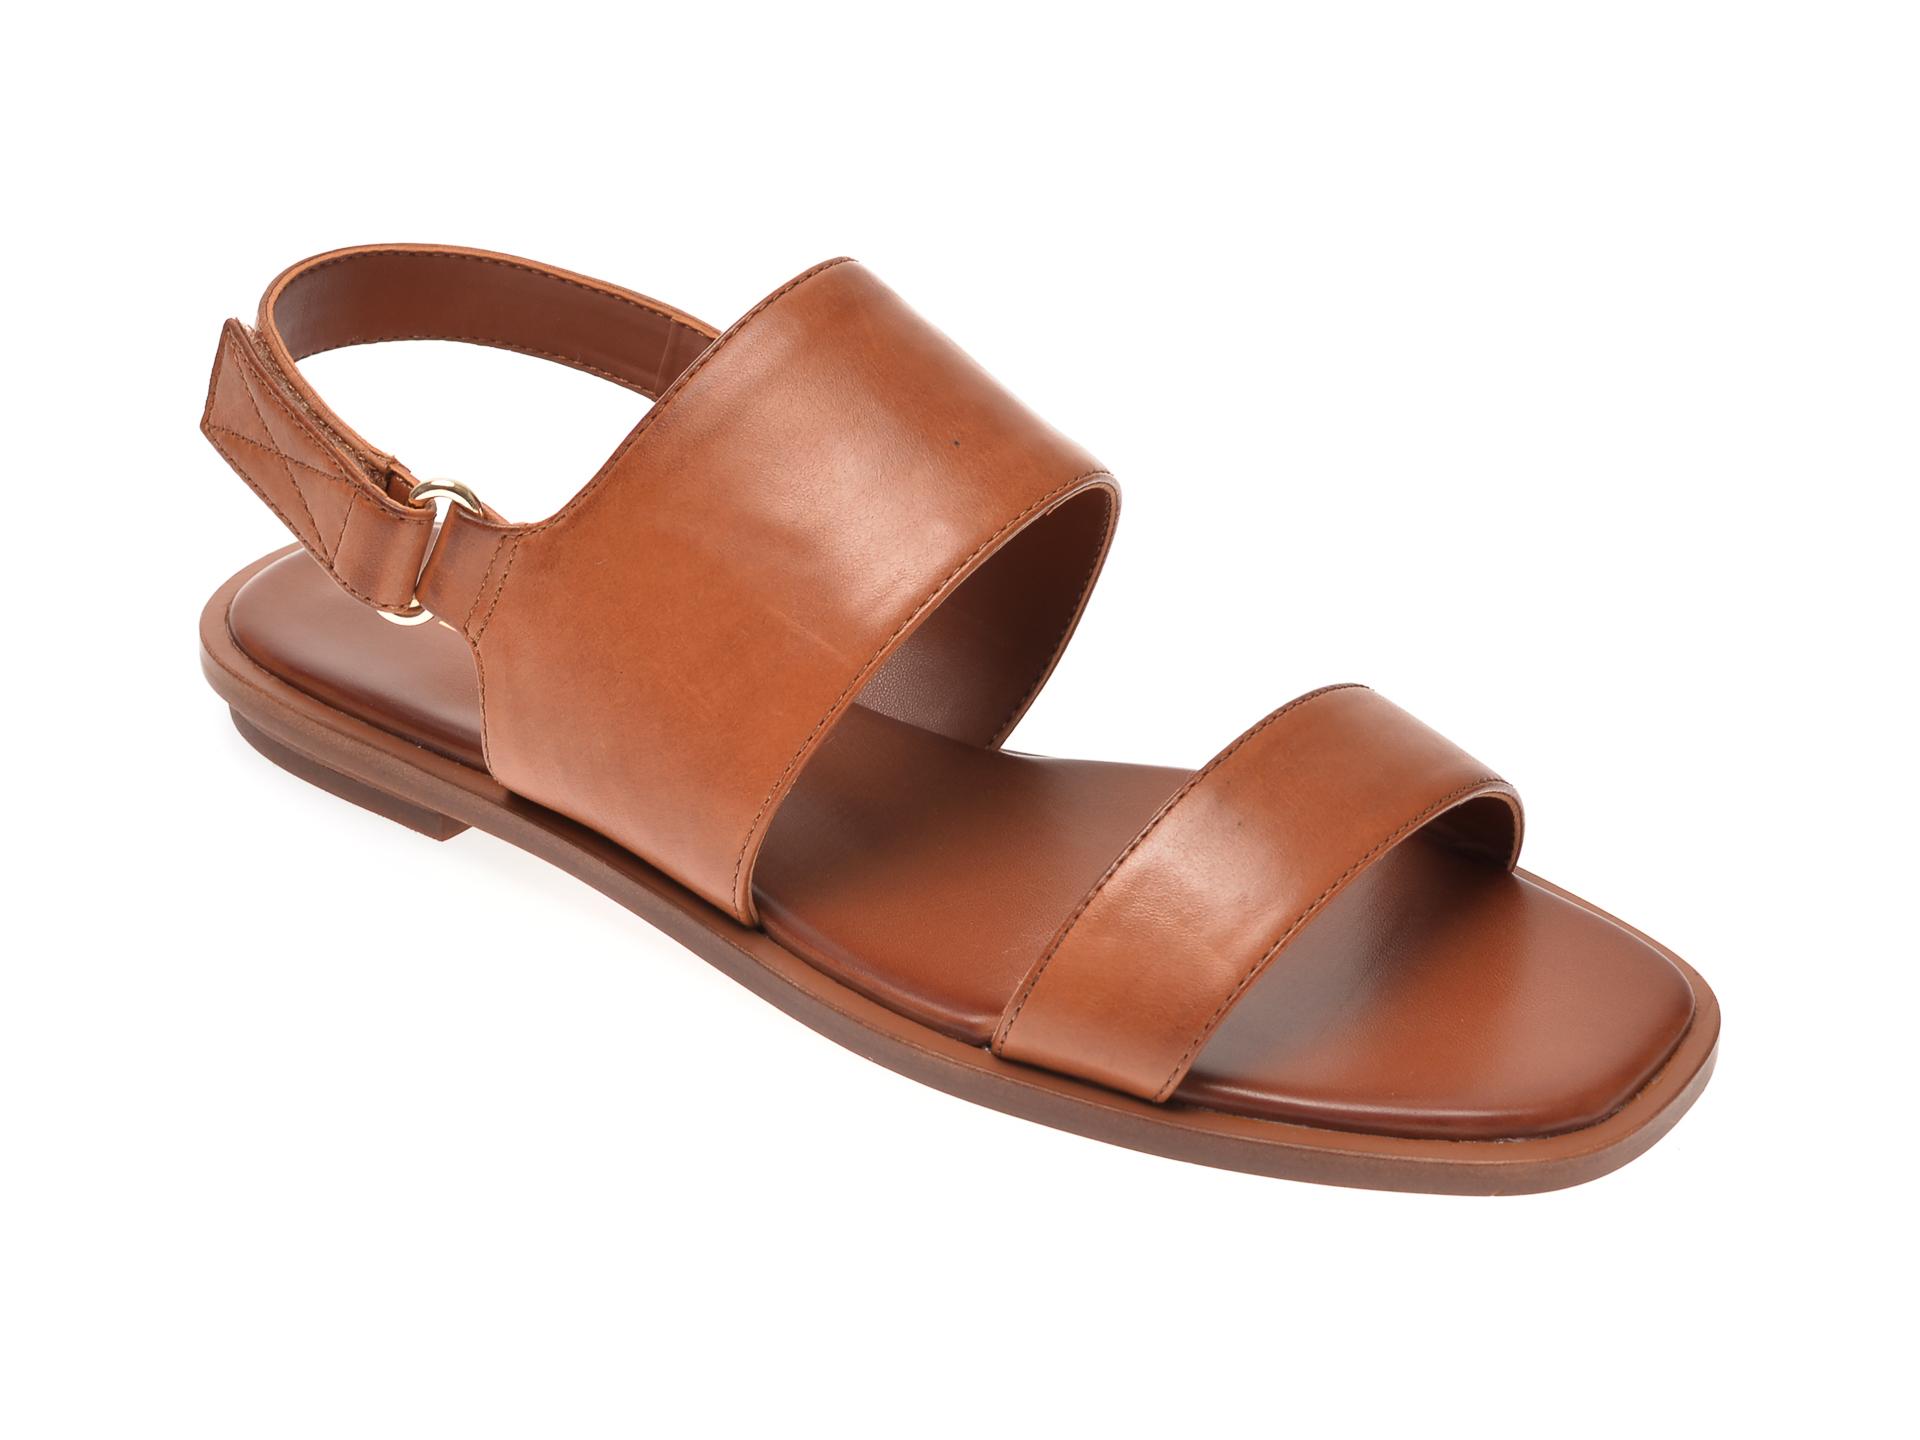 Sandale ALDO maro, Sula220, din piele naturala